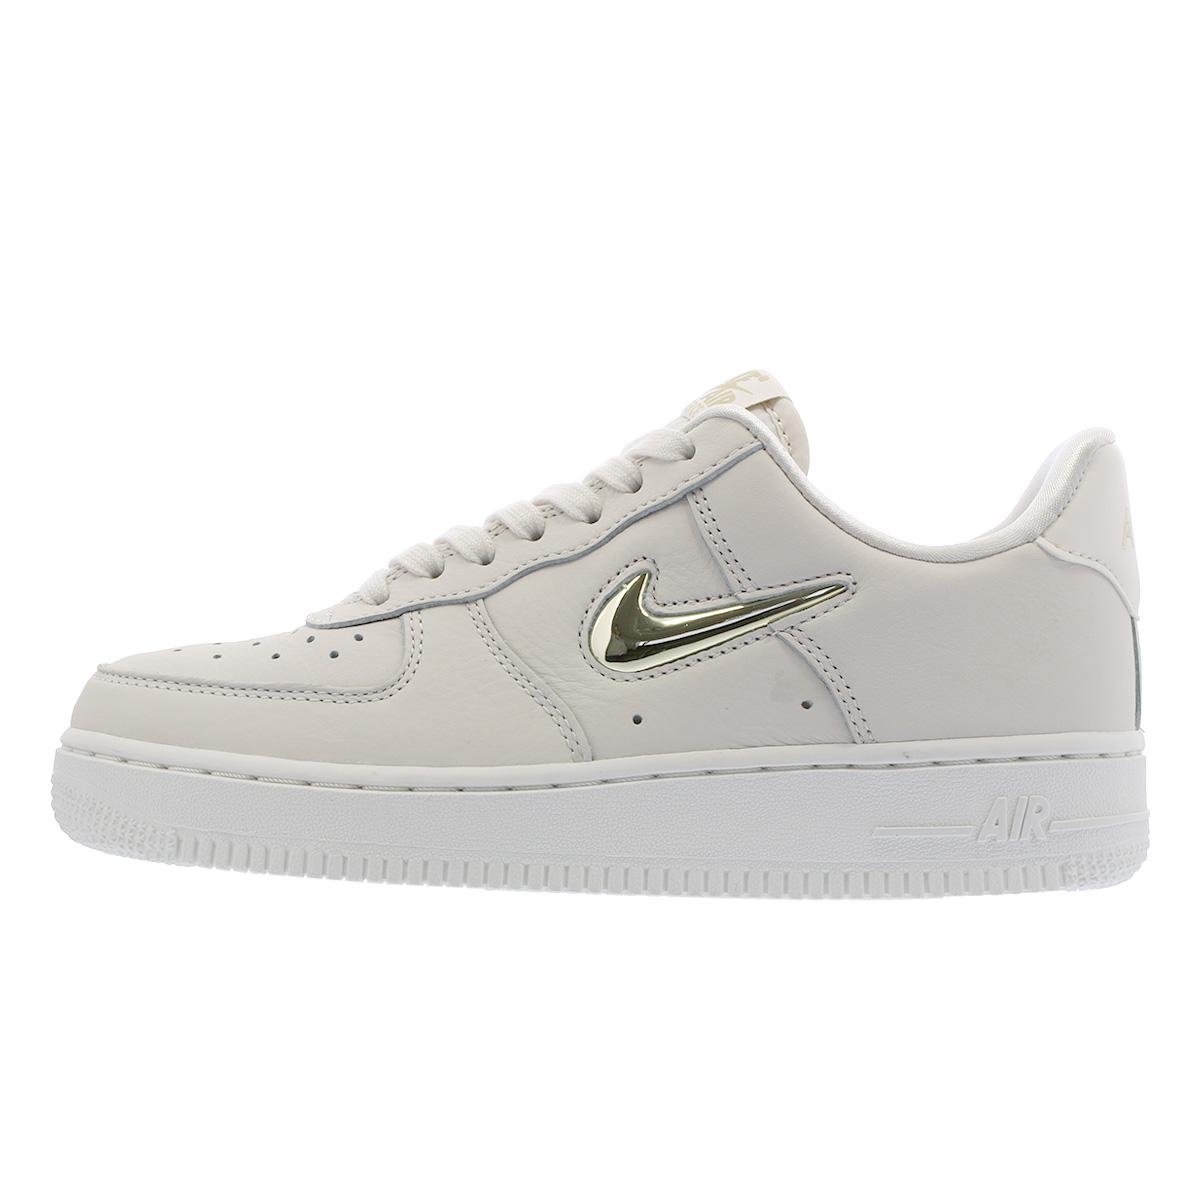 dd8f3eded ... NIKE WMNS AIR FORCE 1  07 PRM LX Nike women air force 1 07 premium ...